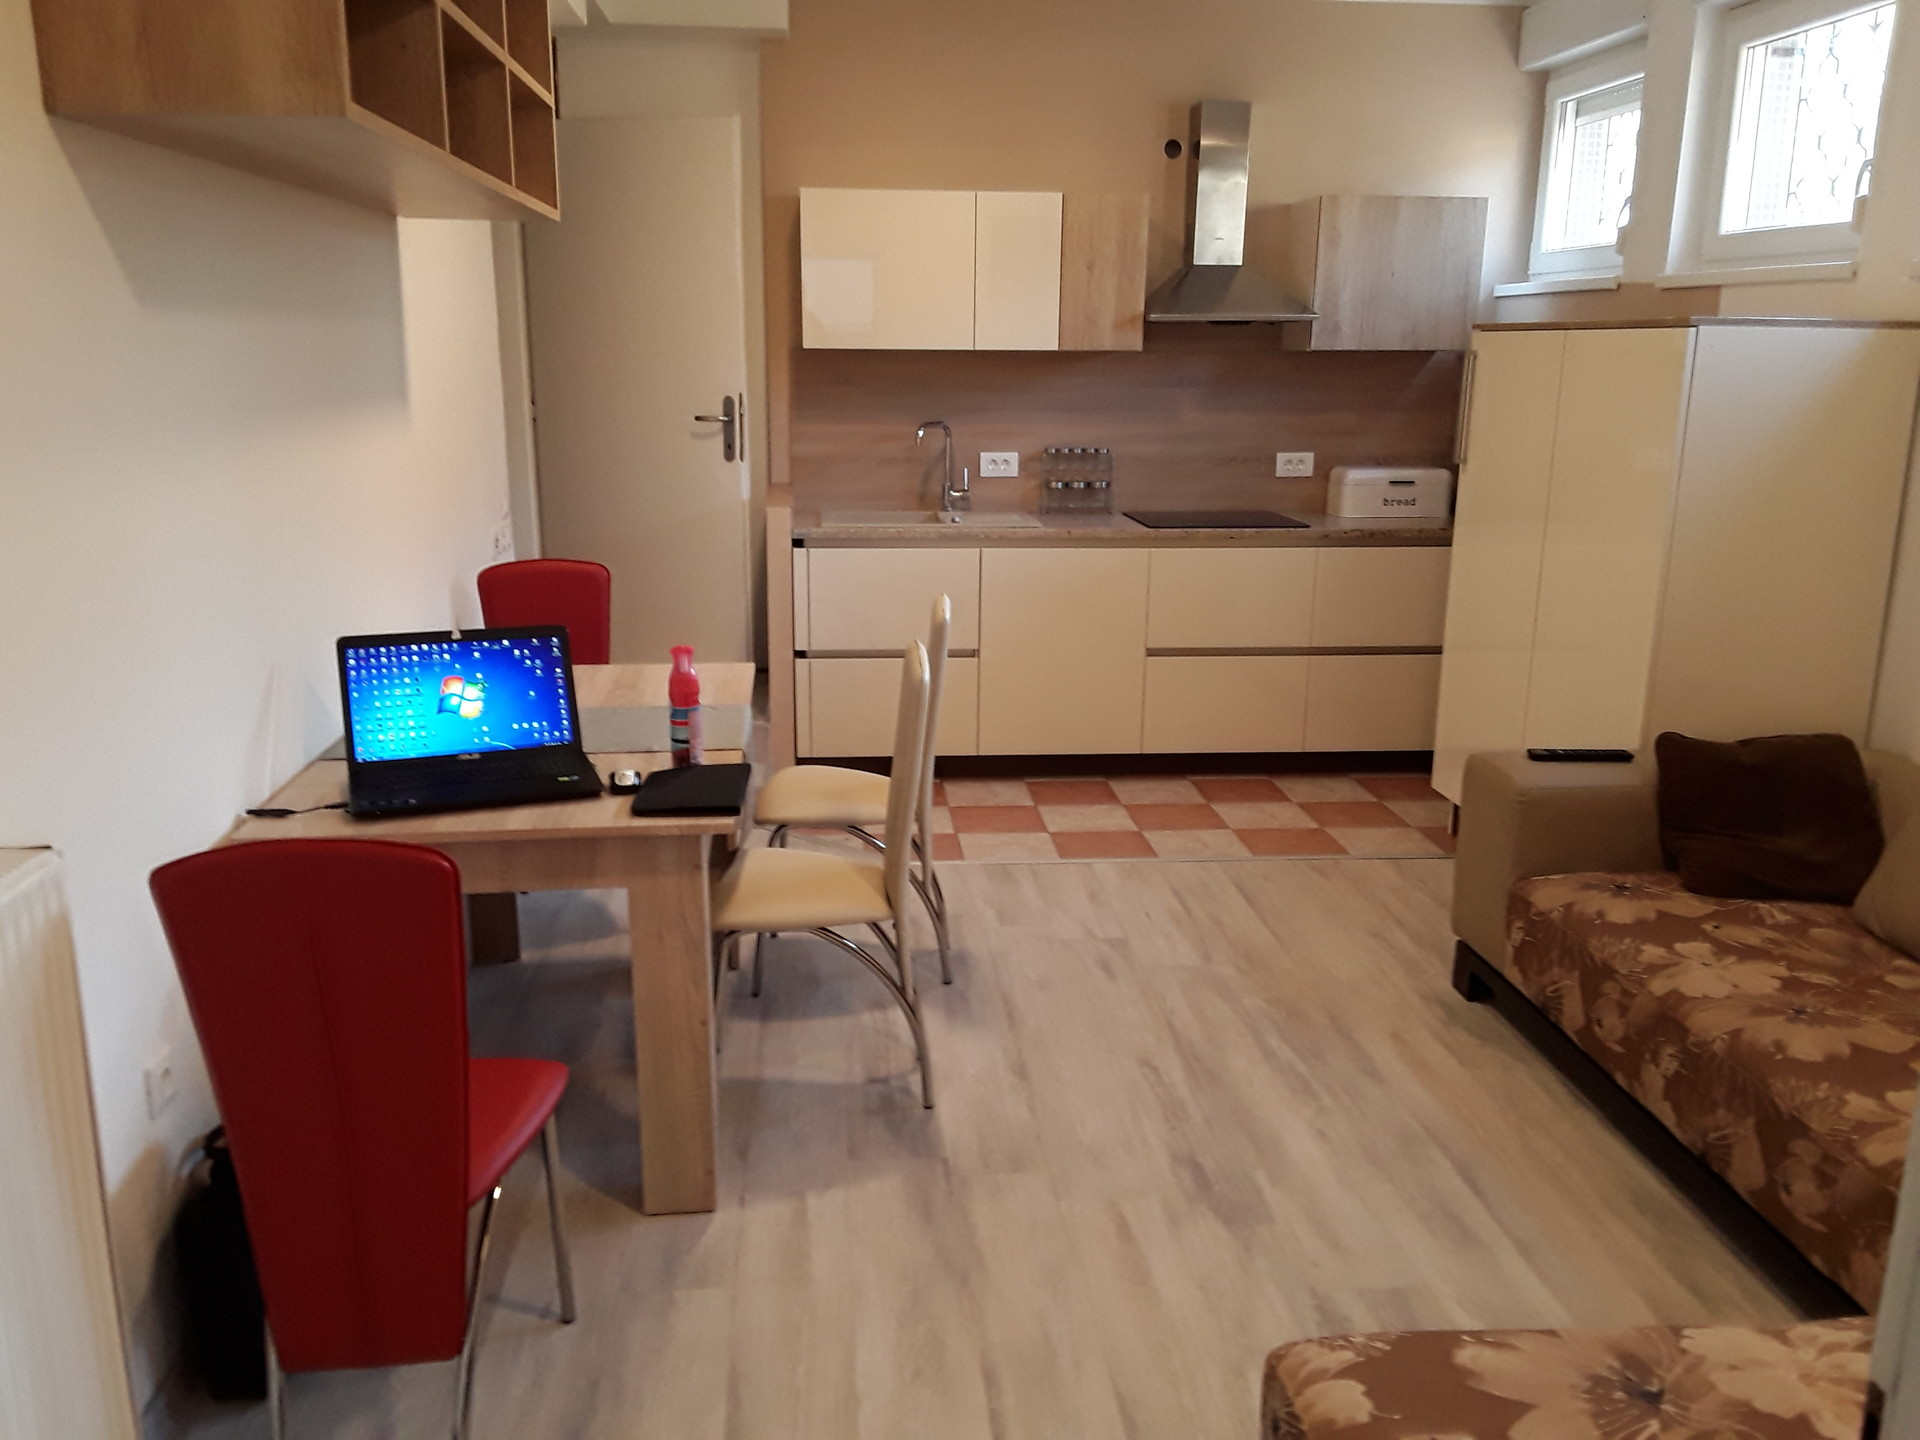 appartement-ljubljana-702d6201d845ef904e10246715cb4921